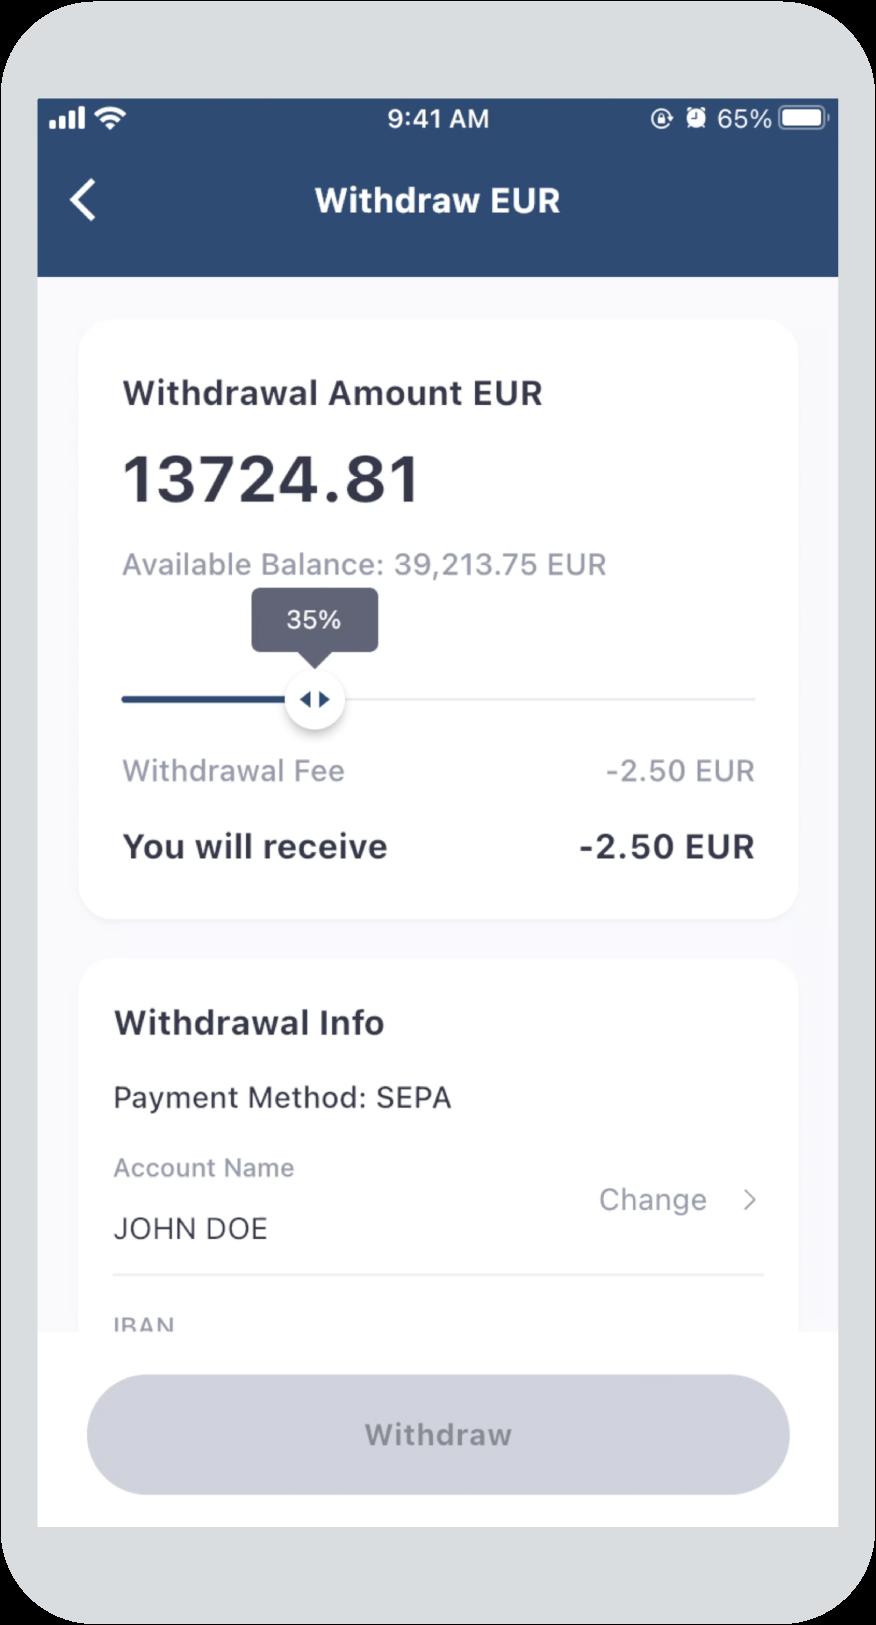 Step 1: Choose withdrawal amount